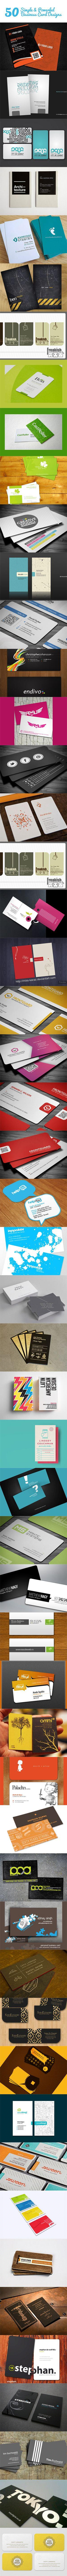 50 Simple & Powerful Business Card Designs --  www.cketch.com